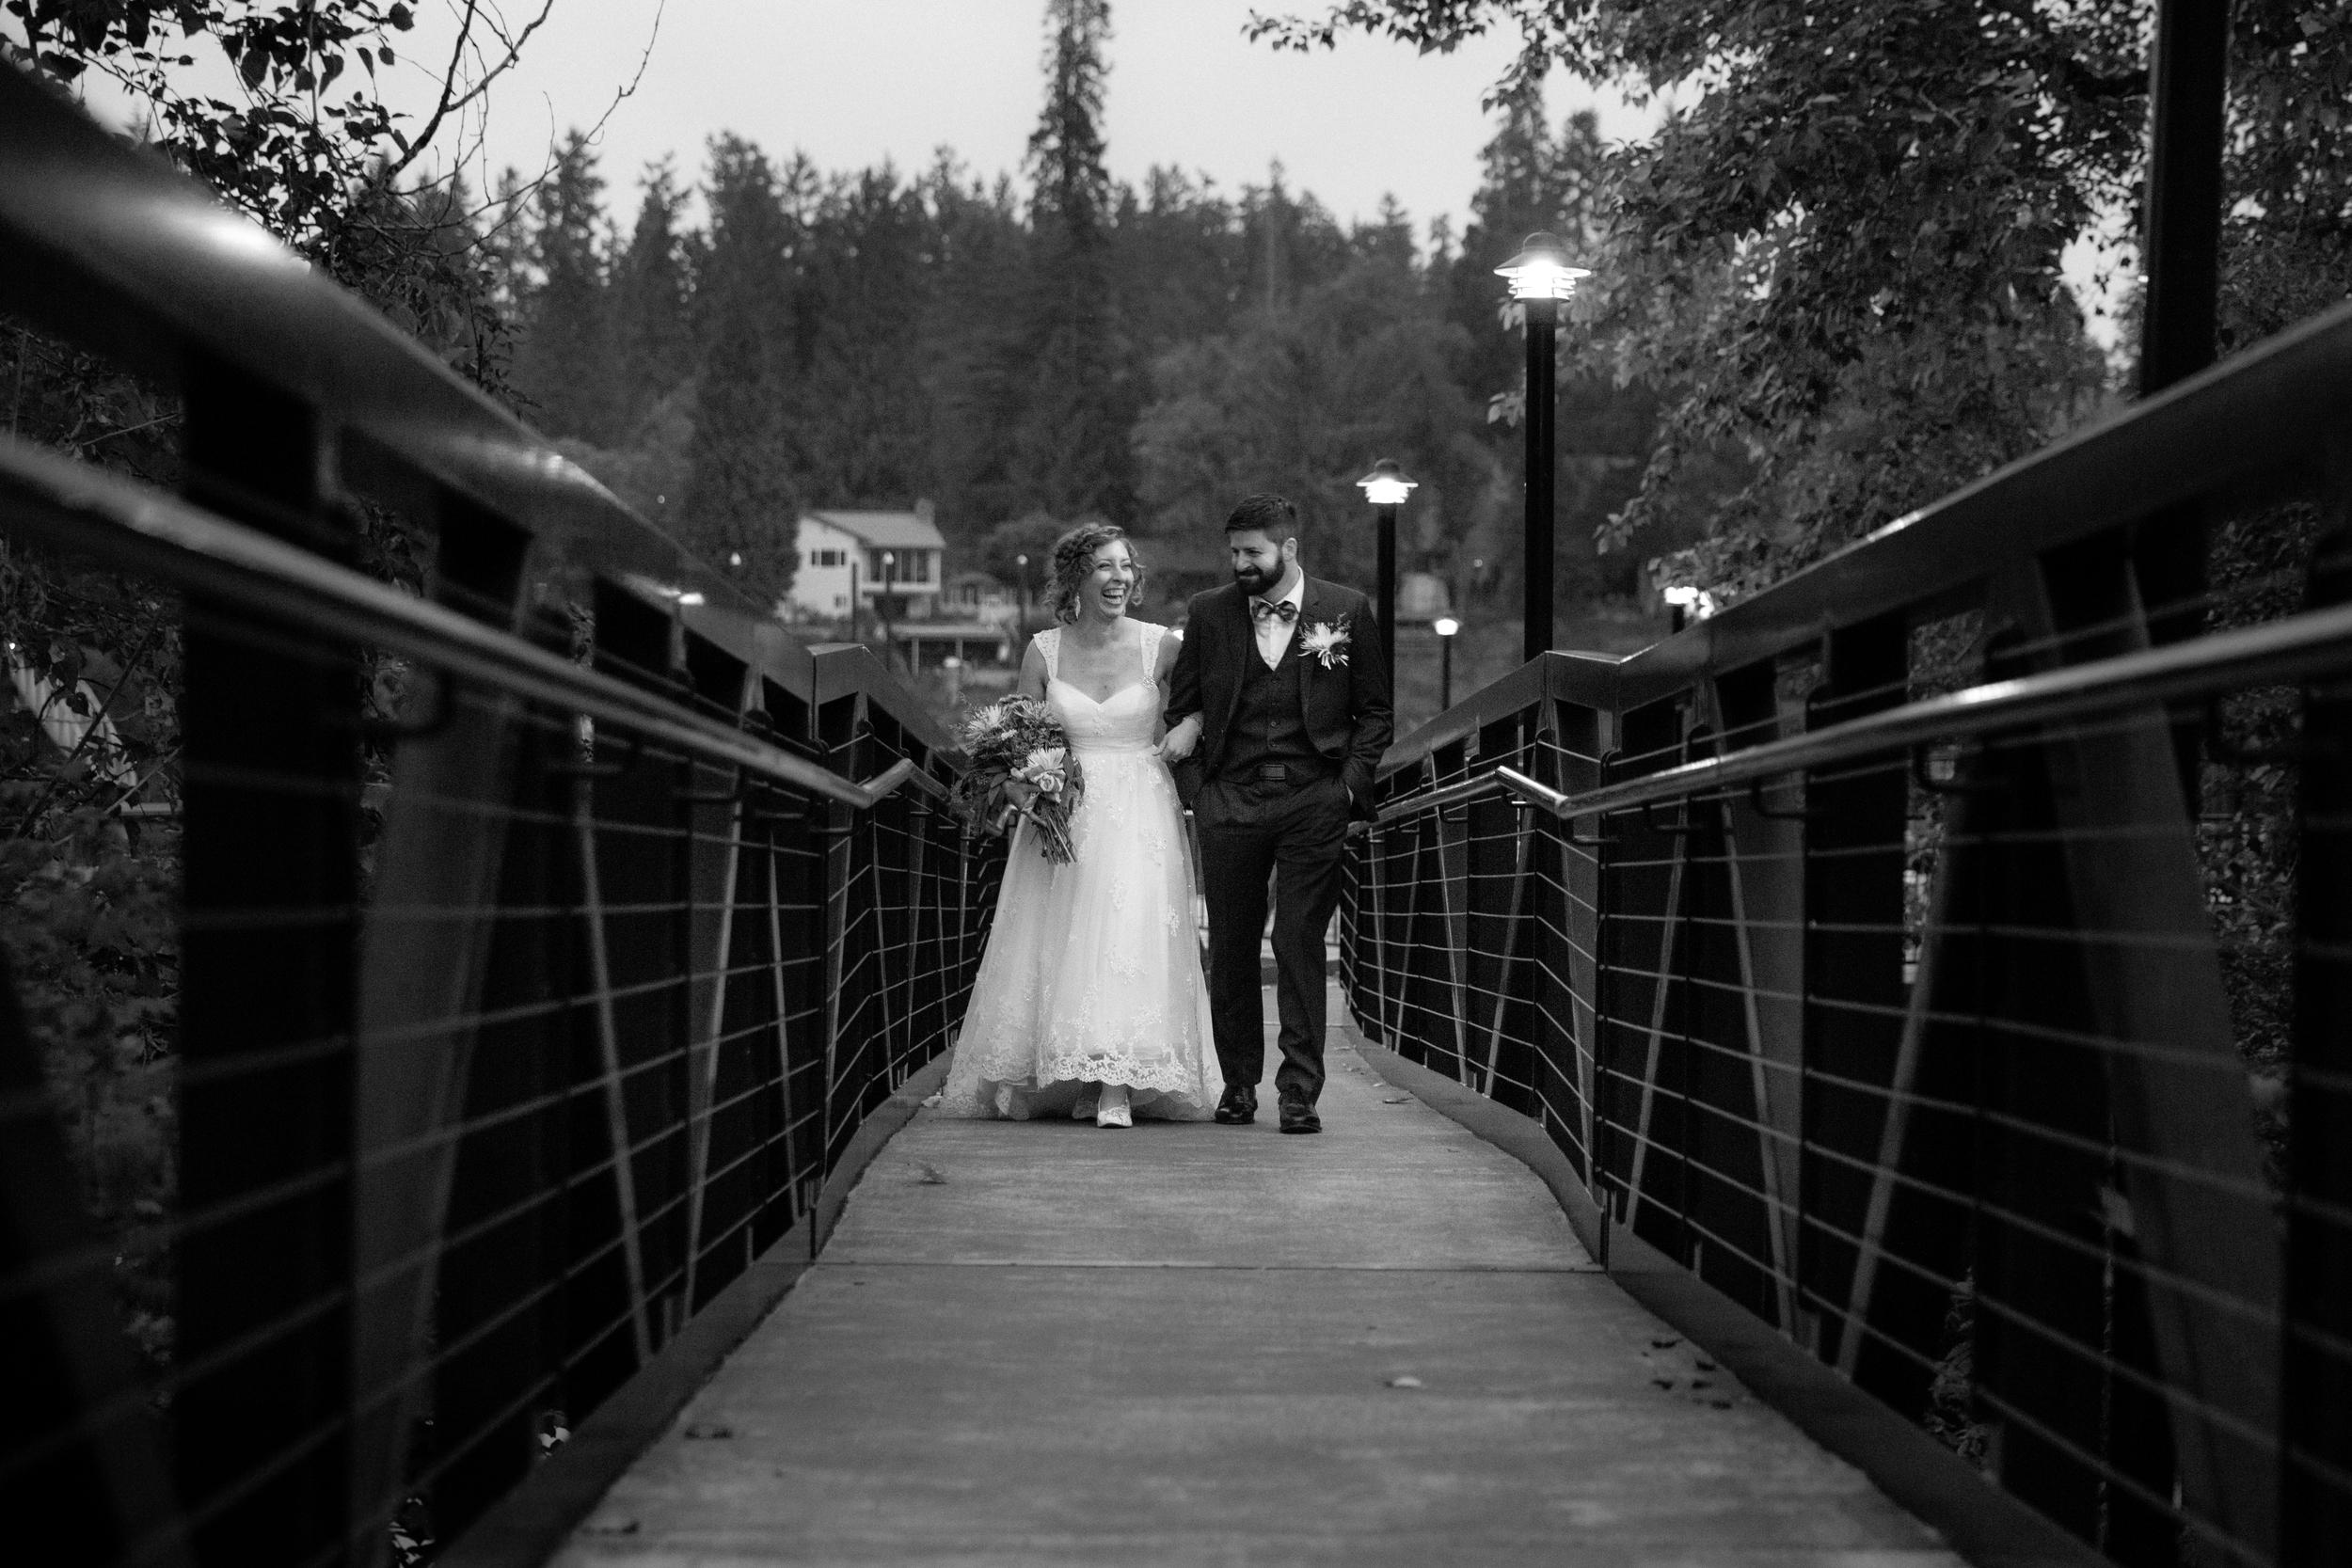 A Wedding Moment: New Bride & Groom  ||  Portland, Oregon